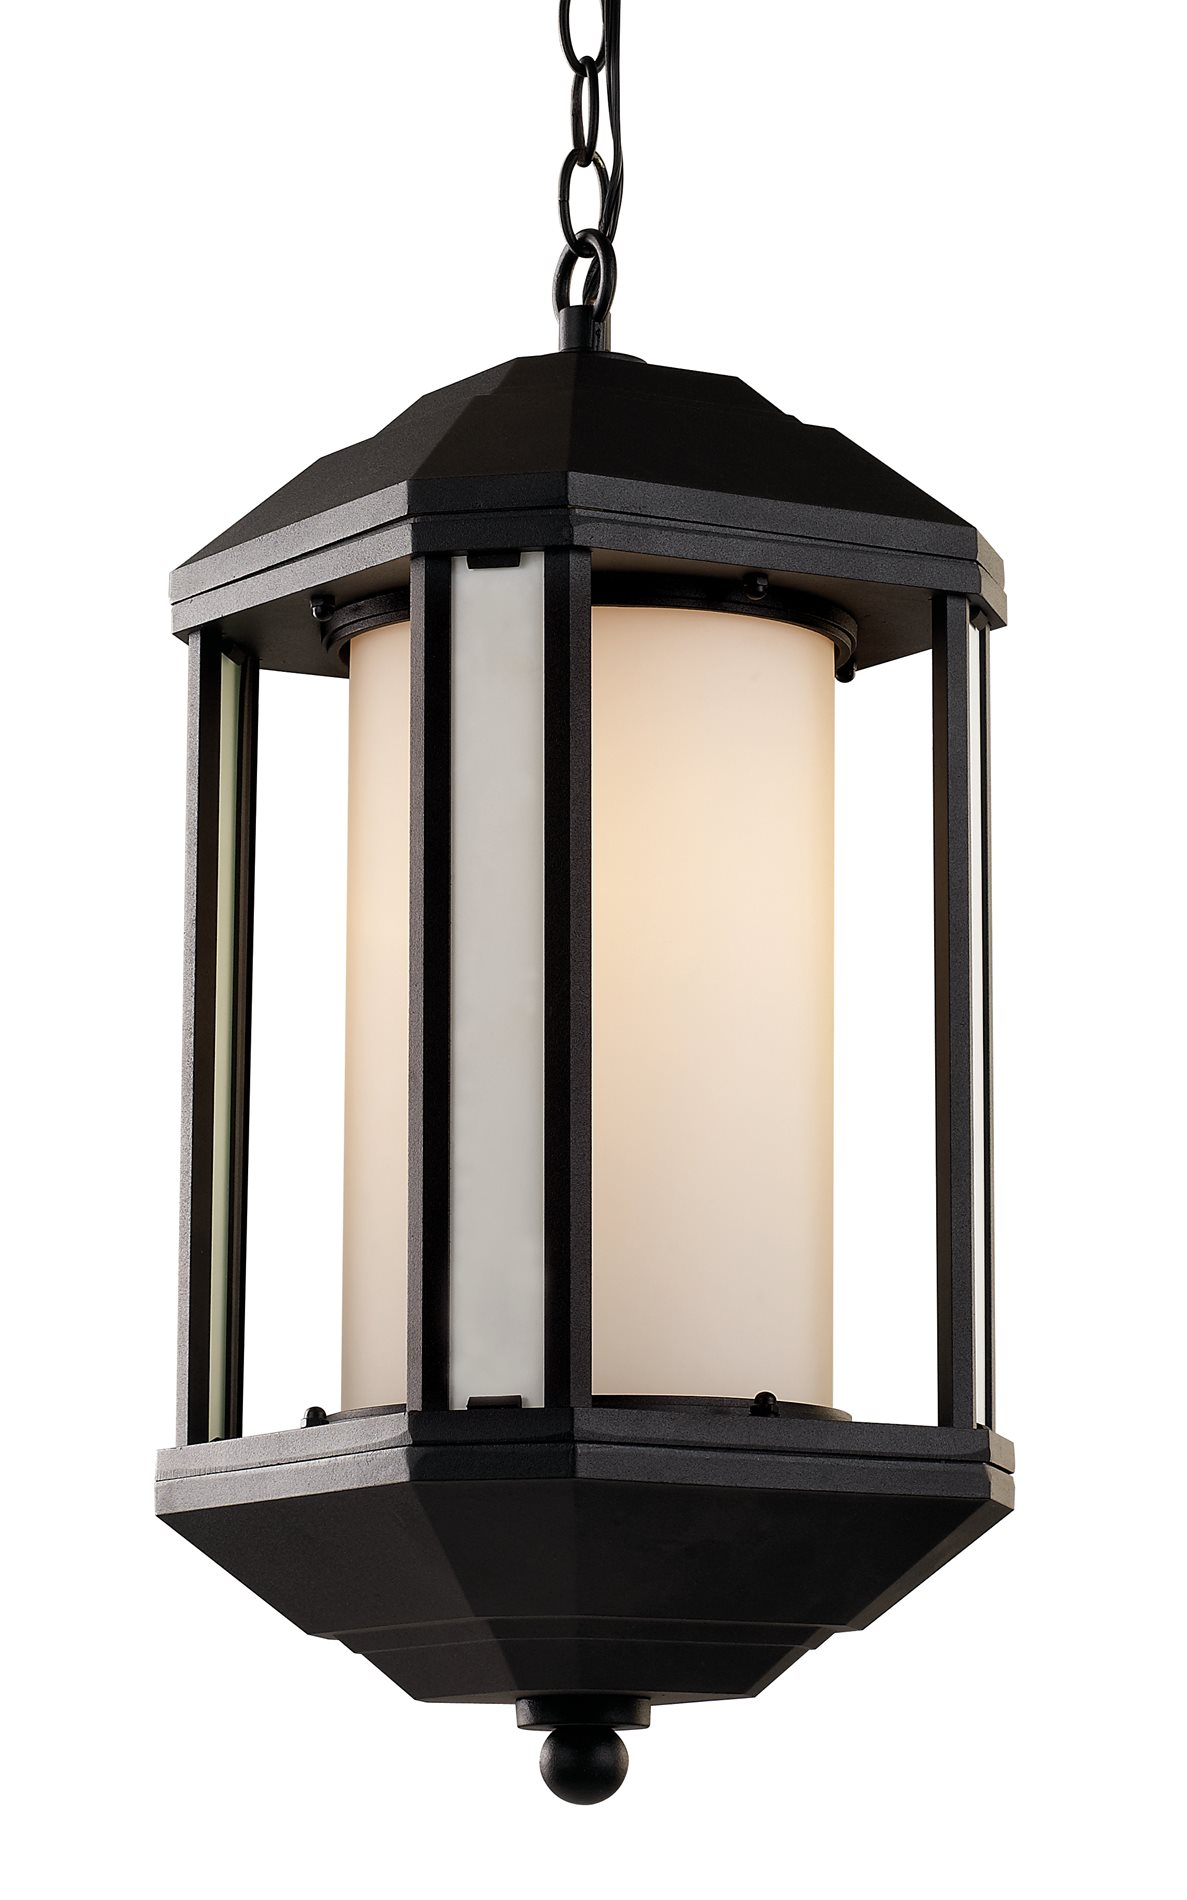 trans globe lighting 40255 bk downtown trolley modern. Black Bedroom Furniture Sets. Home Design Ideas